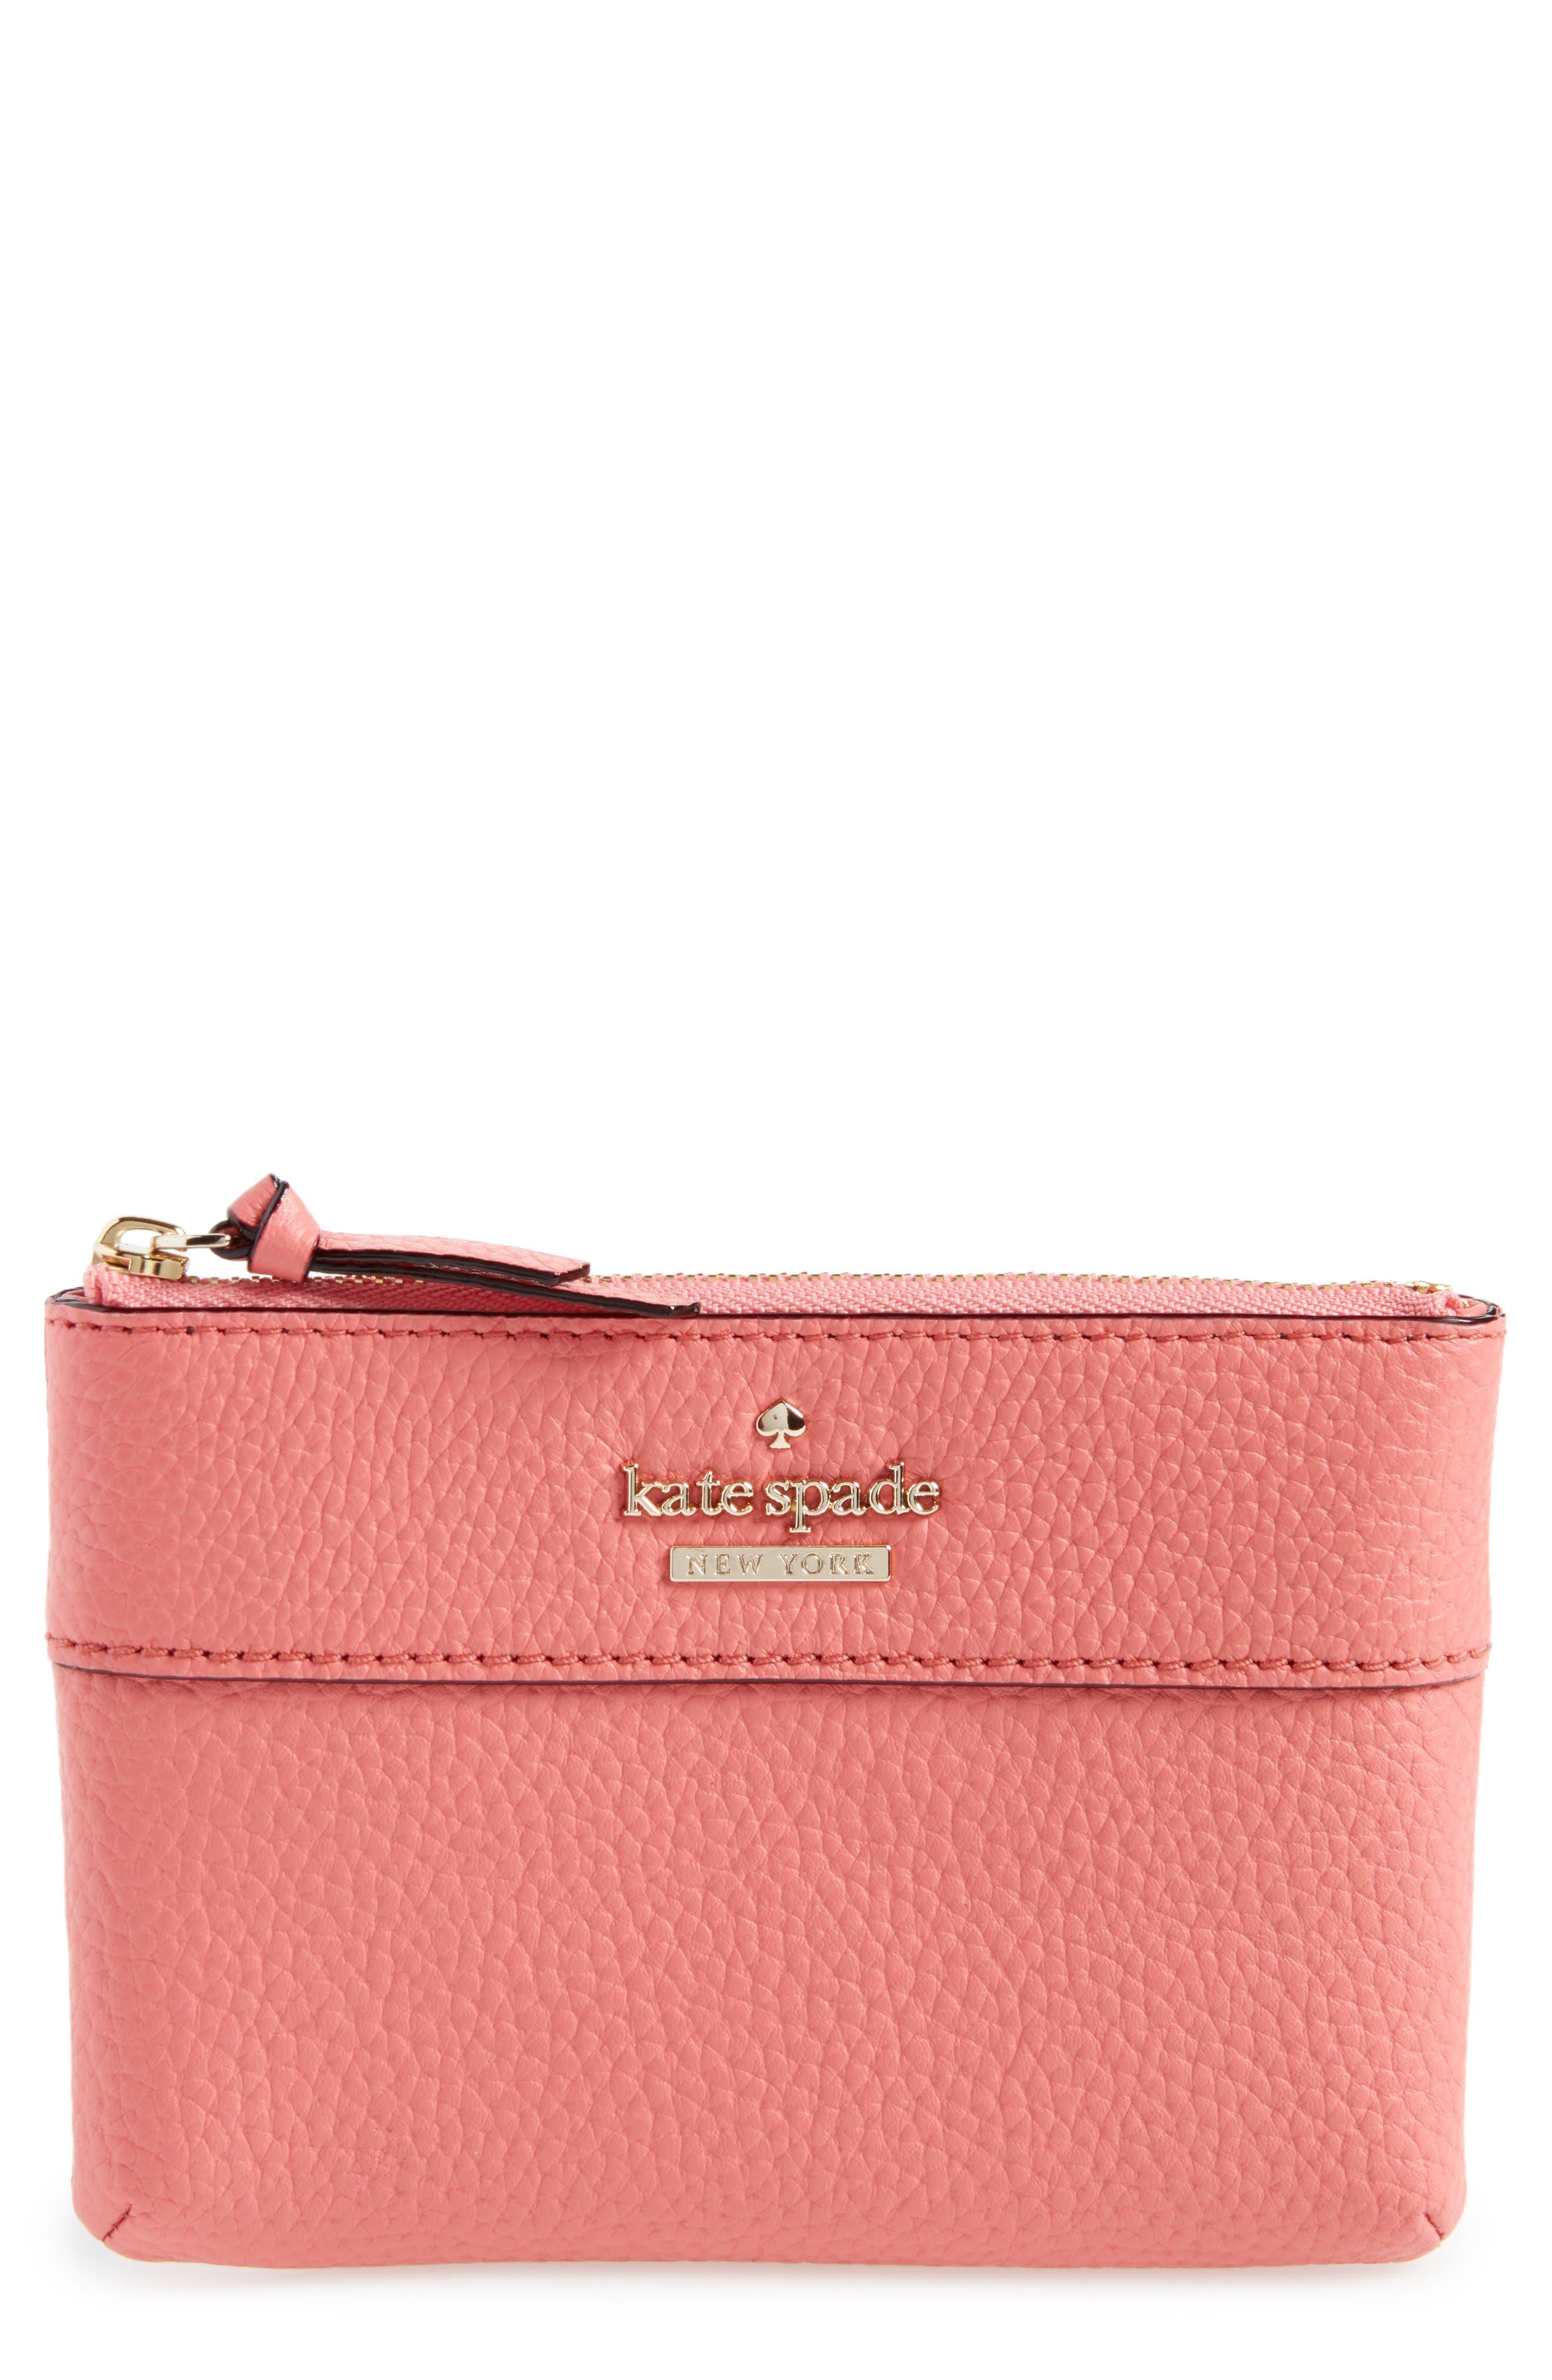 jackson street mila leather zip pouch,                             Main thumbnail 1, color,                             Coral Pebble